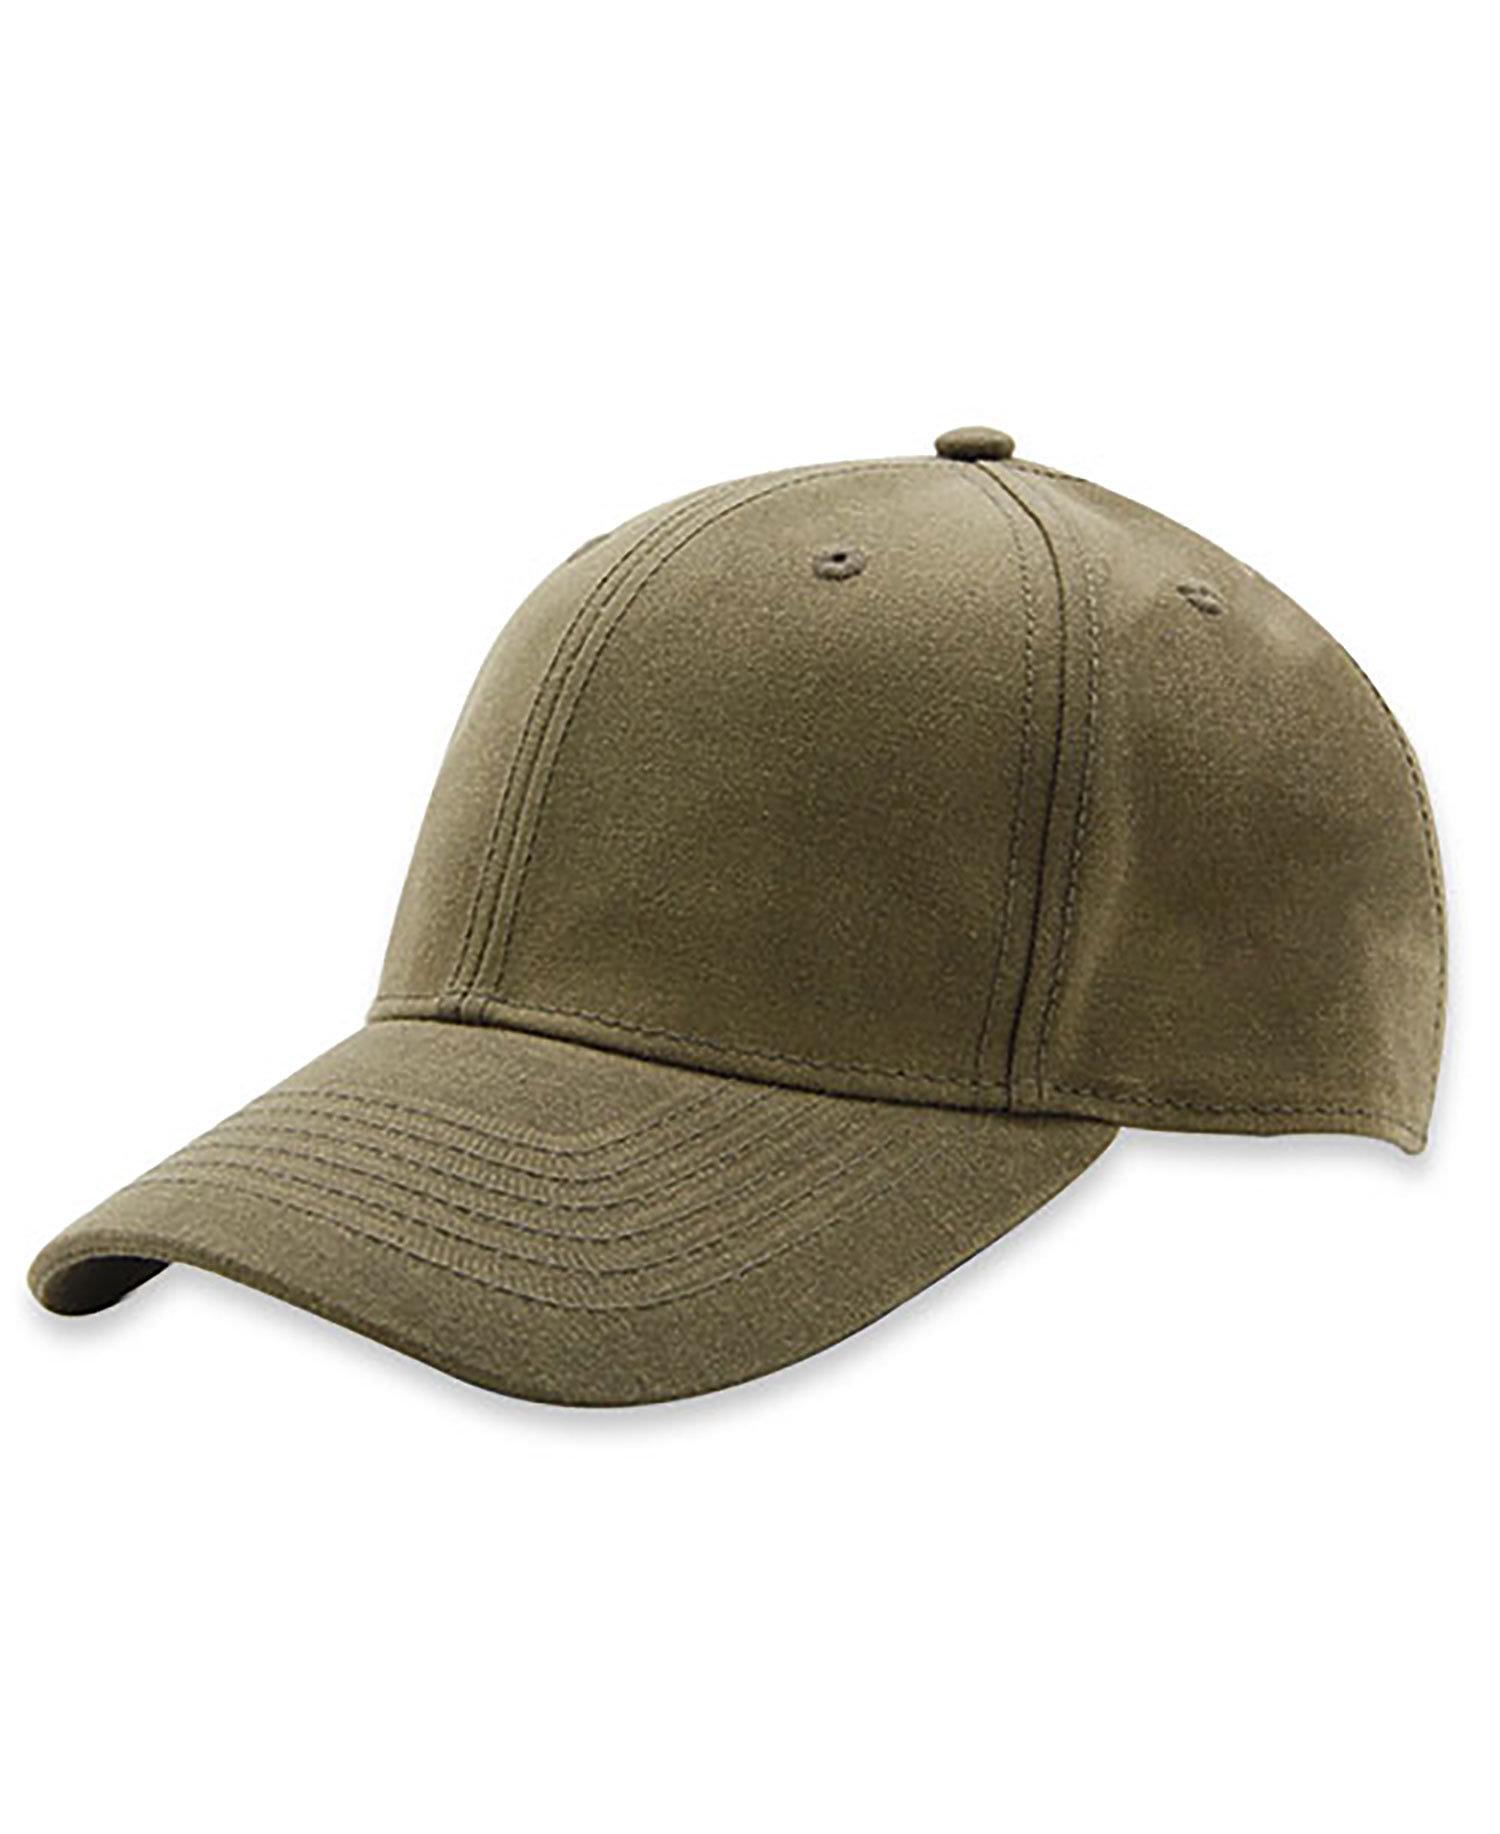 Ouray 51328 - The Drake Oil Skin Cap